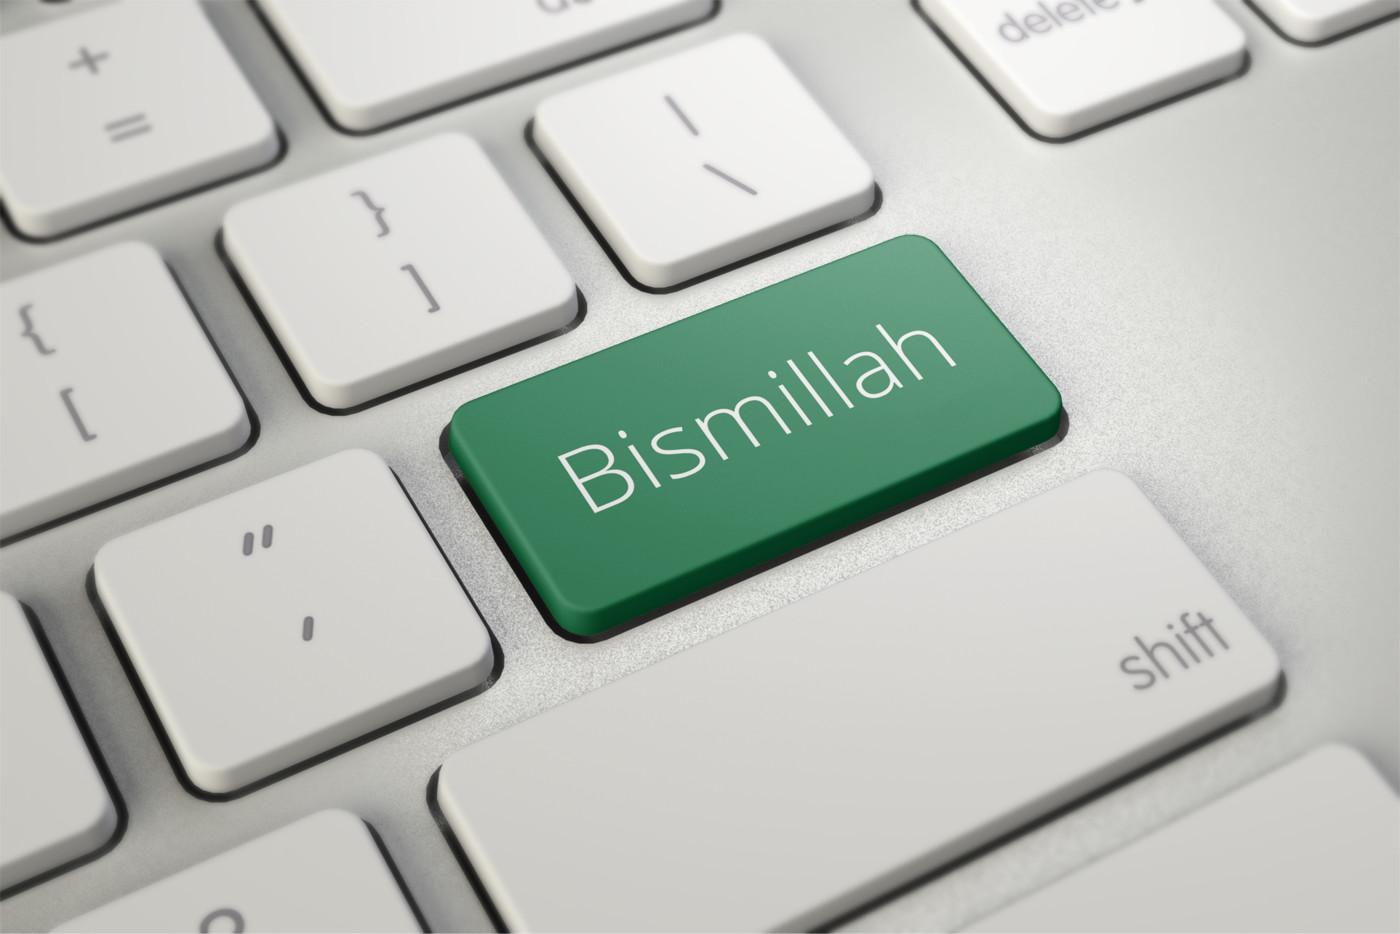 msa-nederland-bismillah